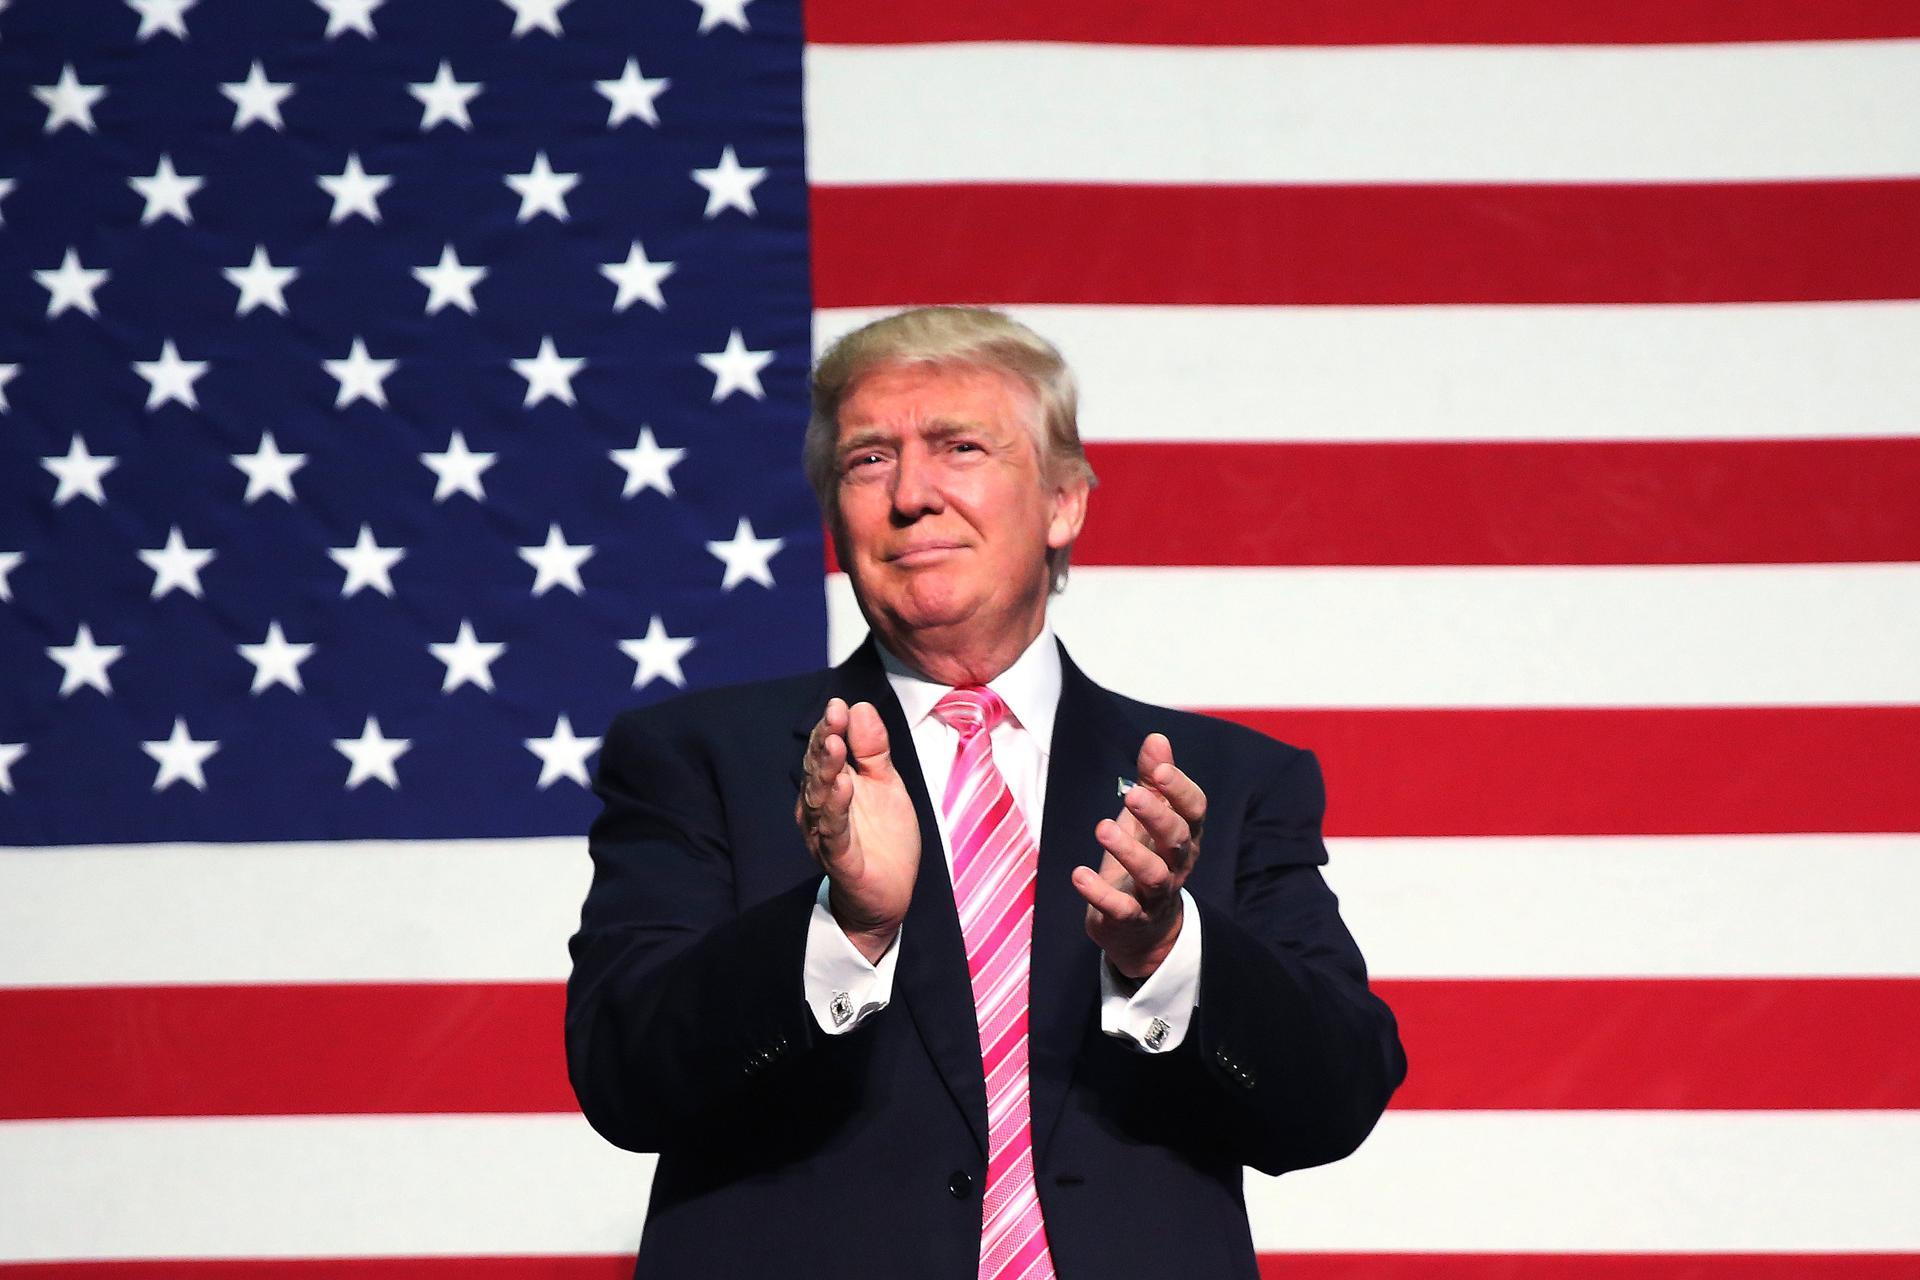 america 2016-08-21T033100Z_302761104_S1BETWQJJGAA_RTRMADP_3_USA-ELECTION-TRUMP